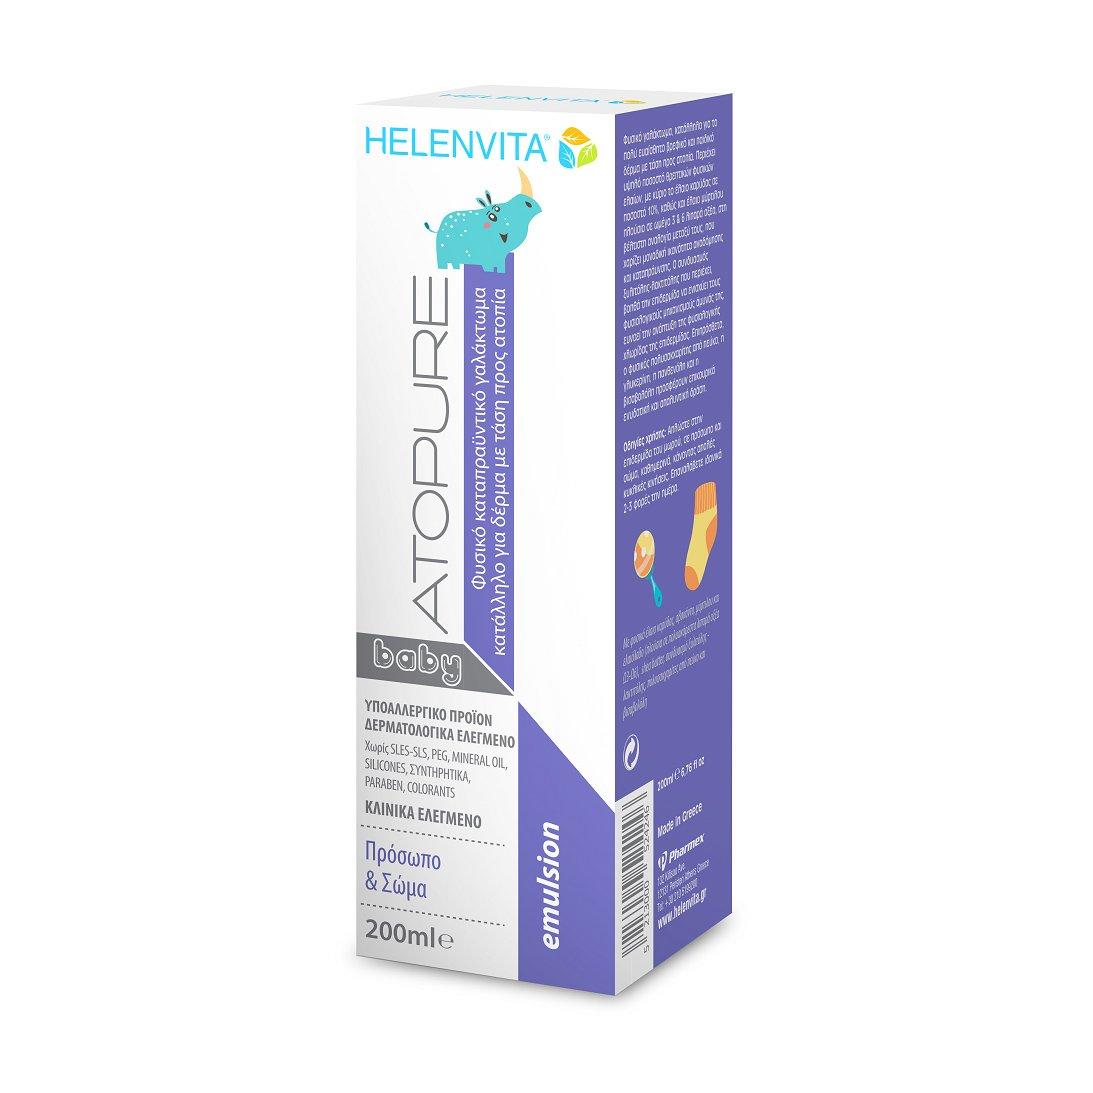 Helenvita Atopure Baby Emulsion Βρεφικό Φυσικό Καταπραϋντικό Γαλάκτωμα Κατάλληλο για Δέρμα με Τάση Ατοπίας 200ml